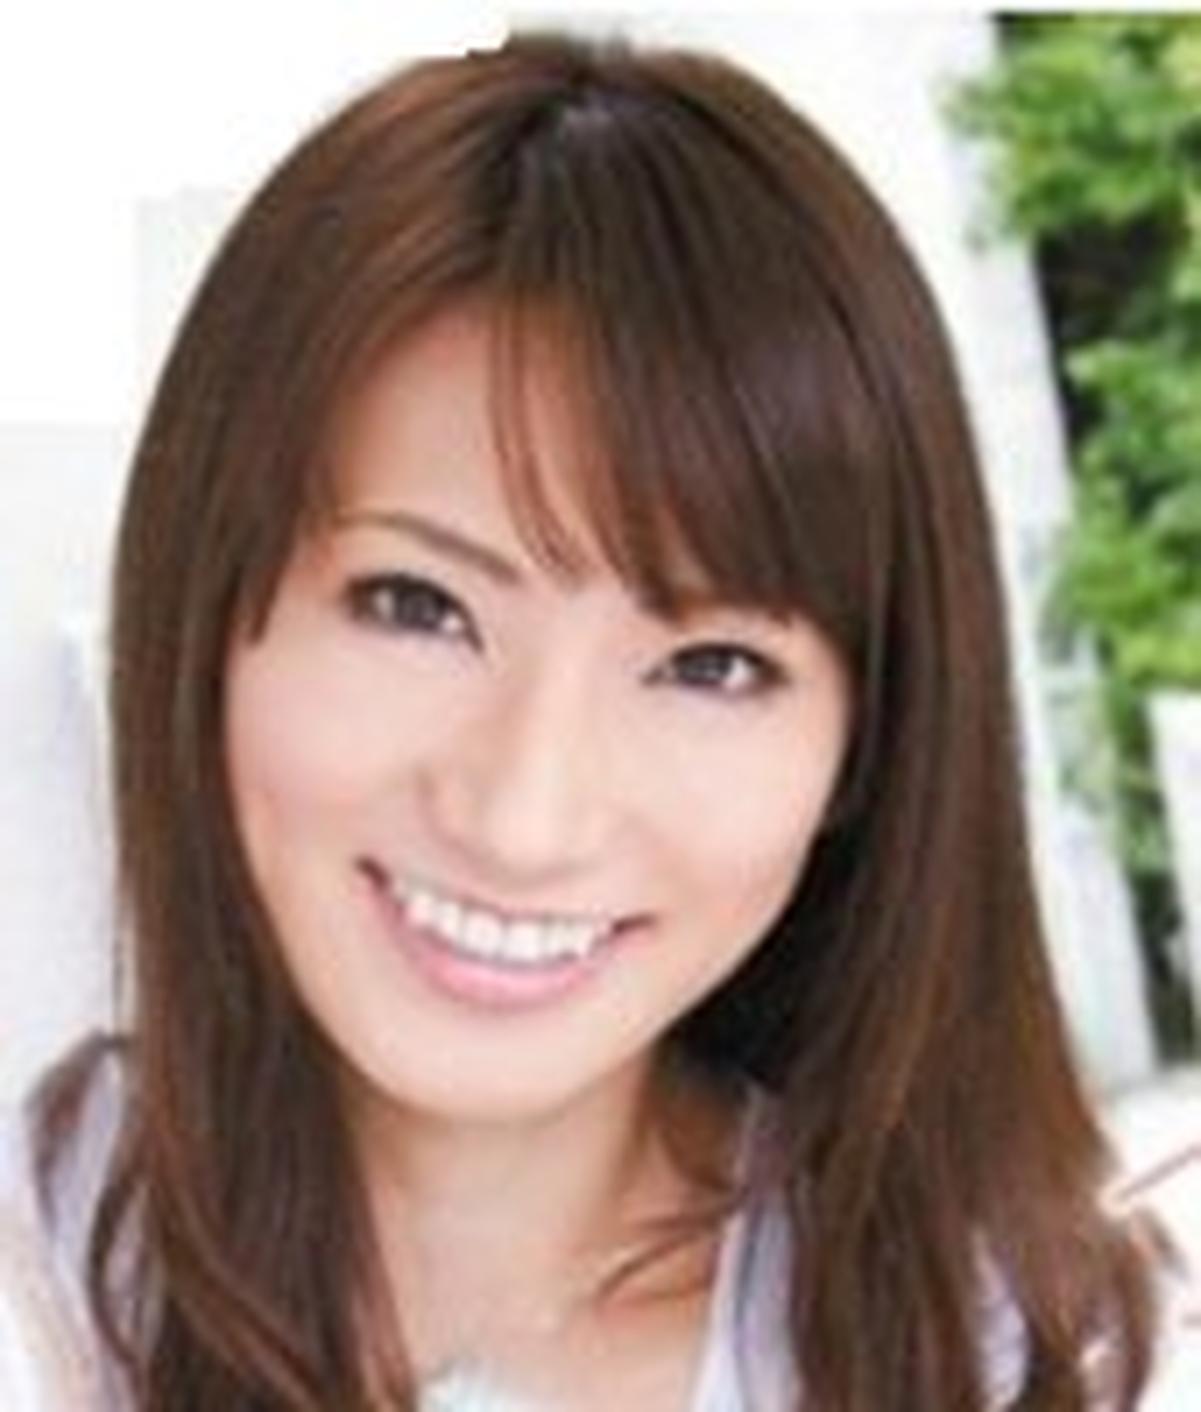 Saki Kozai